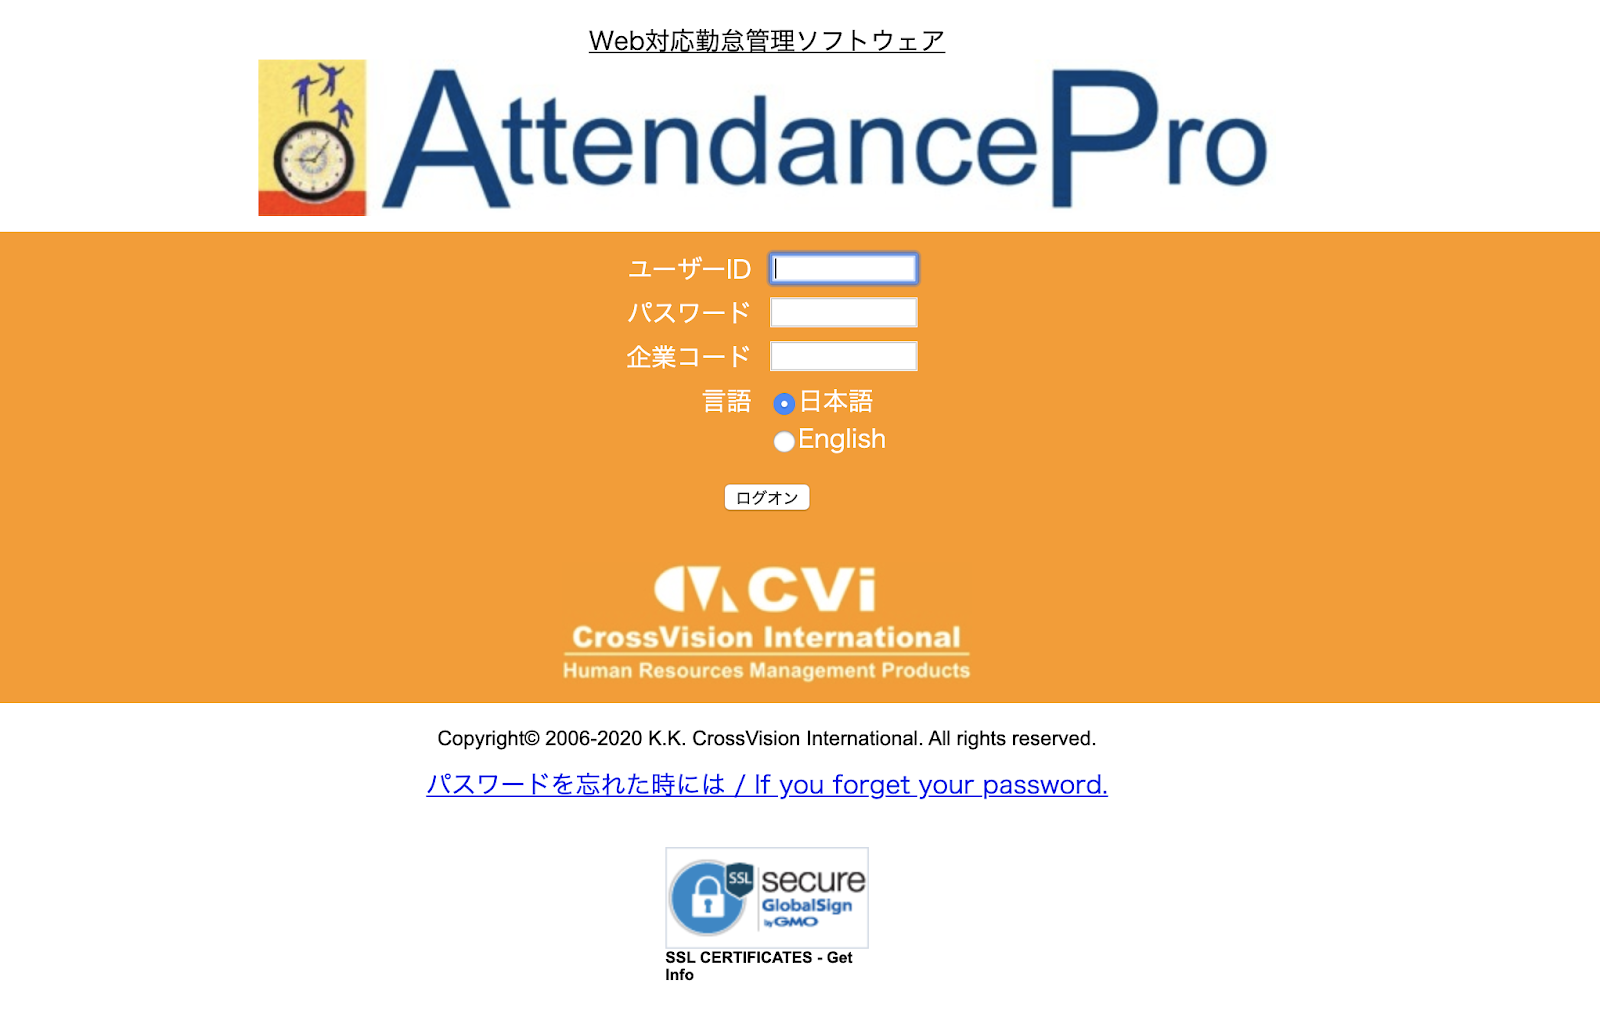 「AttendancePro」キャプチャ